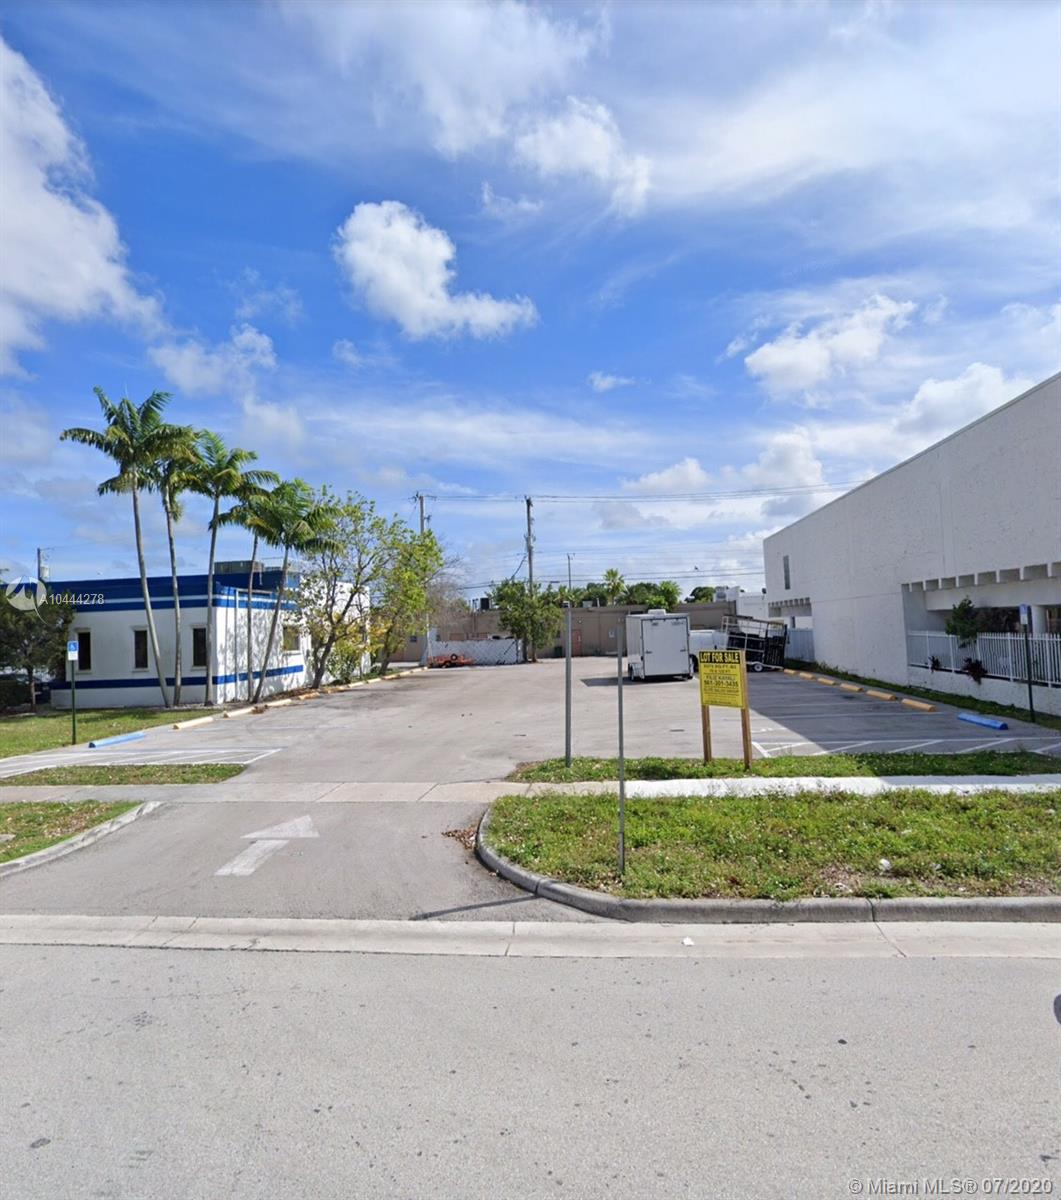 84 NE 168th St, North Miami Beach, Florida 33162, ,Commercial Land,For Sale,84 NE 168th St,A10444278